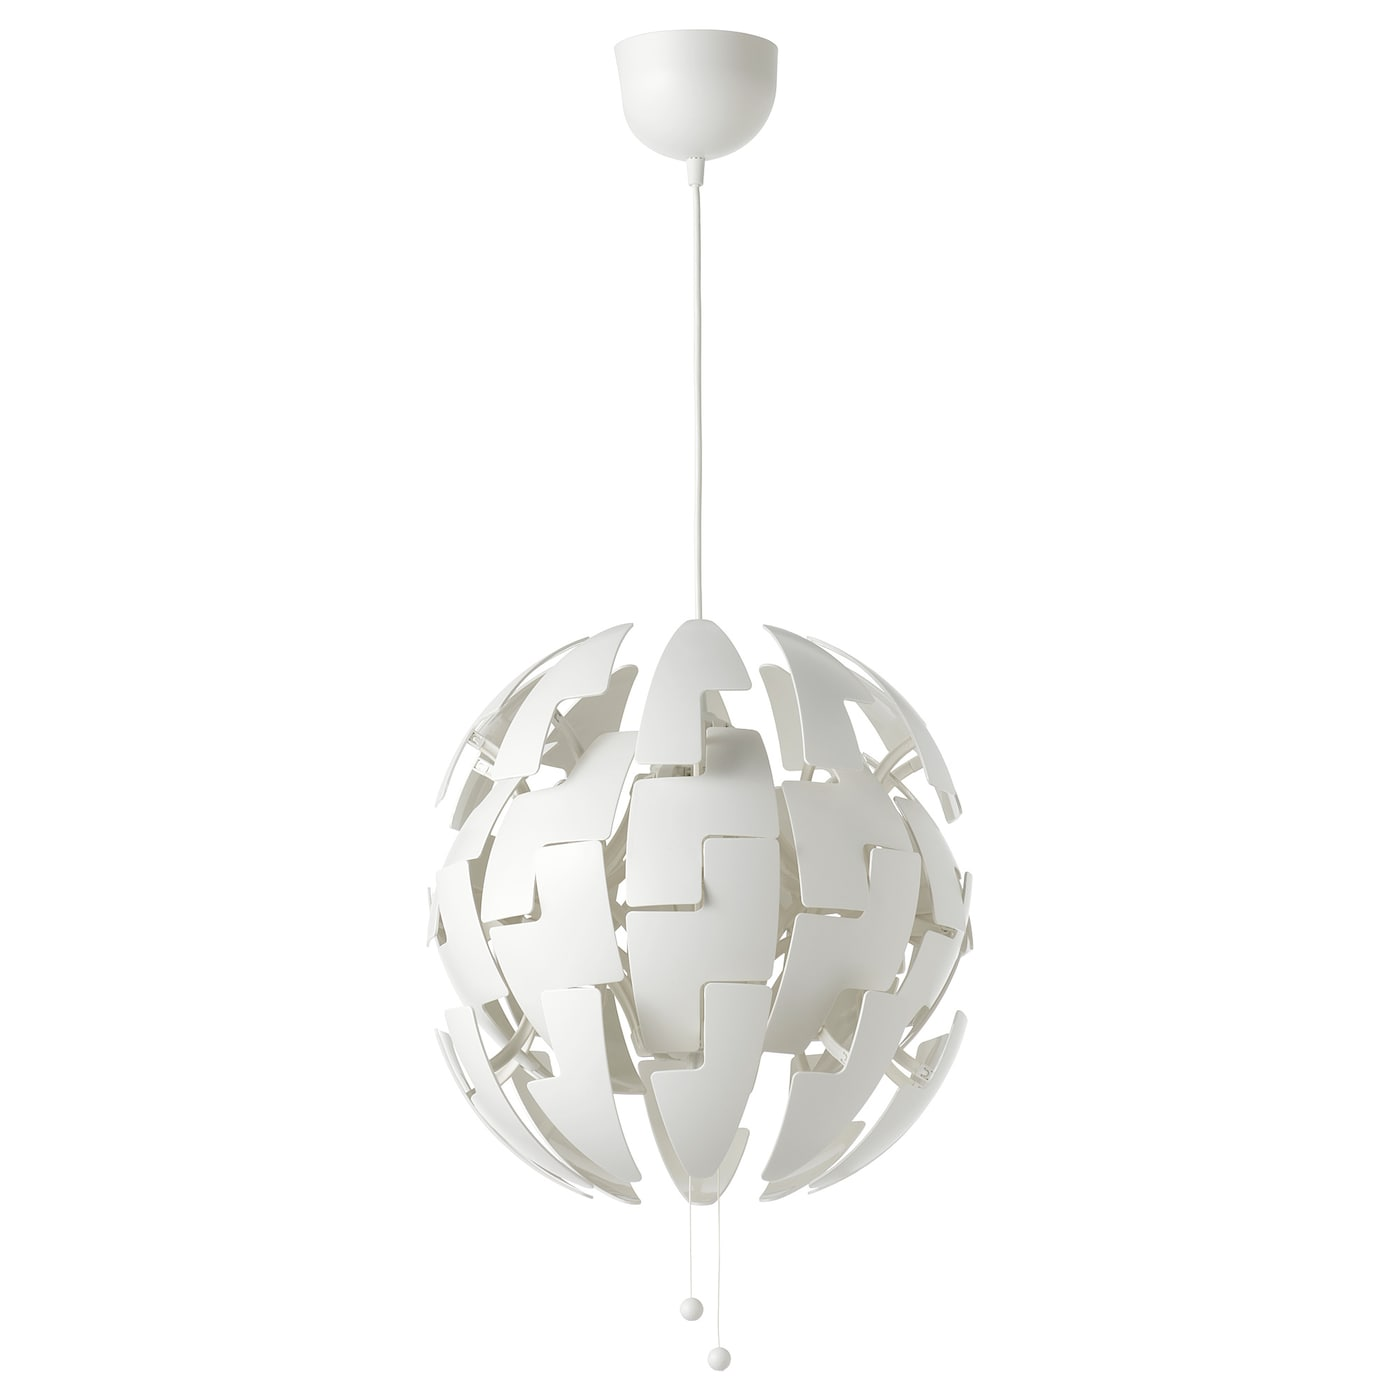 IKEA PS 2014 Taklampa vit 35 cm